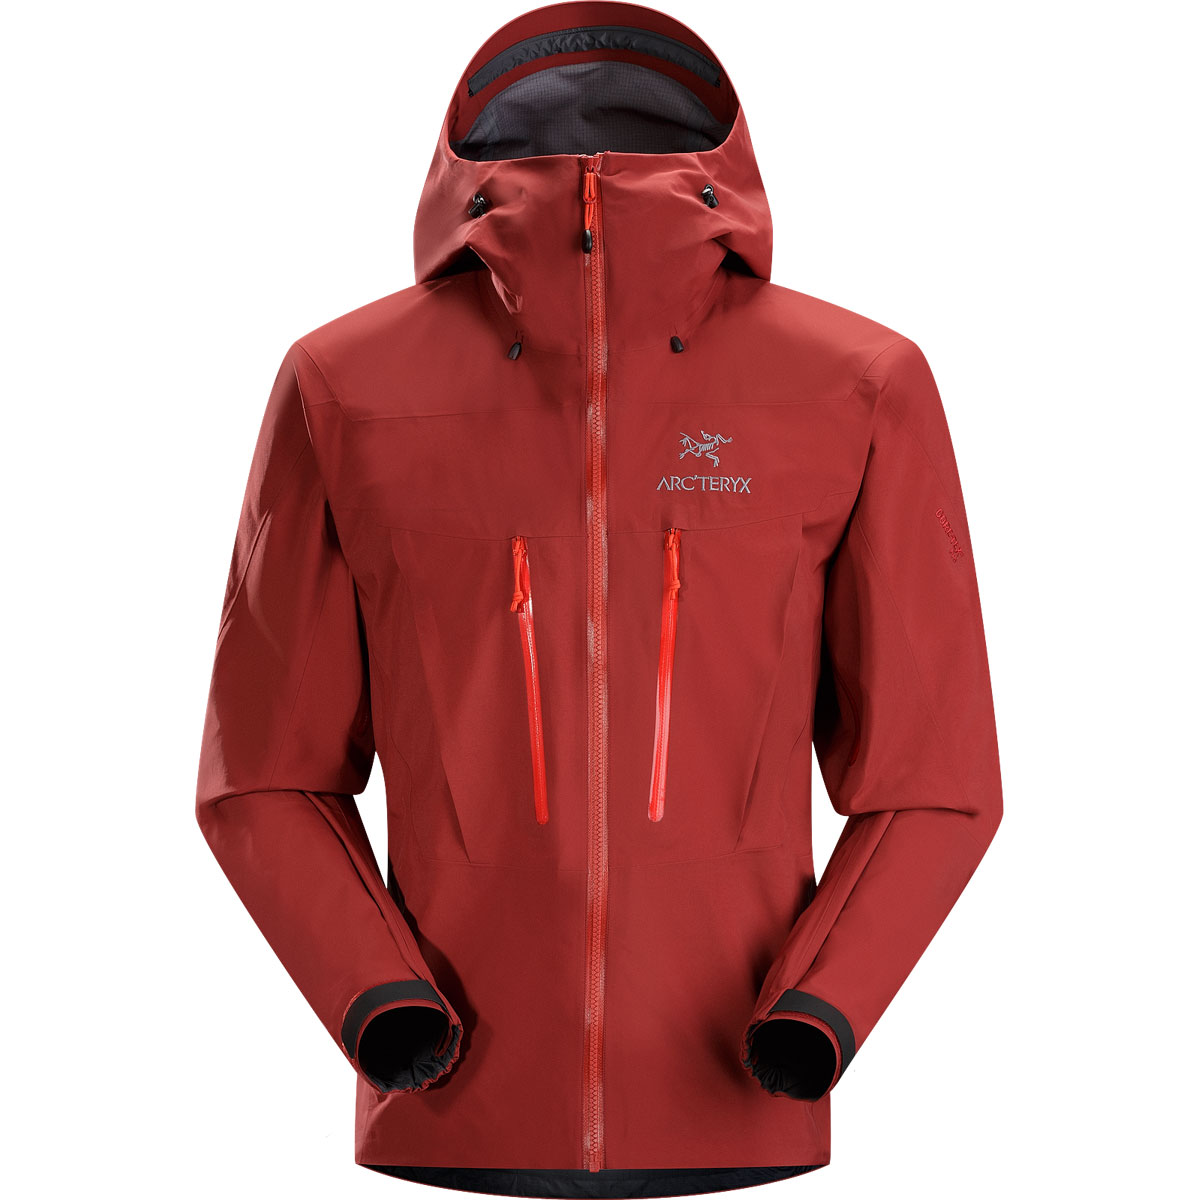 Arc U0026 39 Teryx Alpha Sv Jacket  Men U0026 39 S  Spring 2016  Free Ground Shipping     Waterproof Shell Jackets